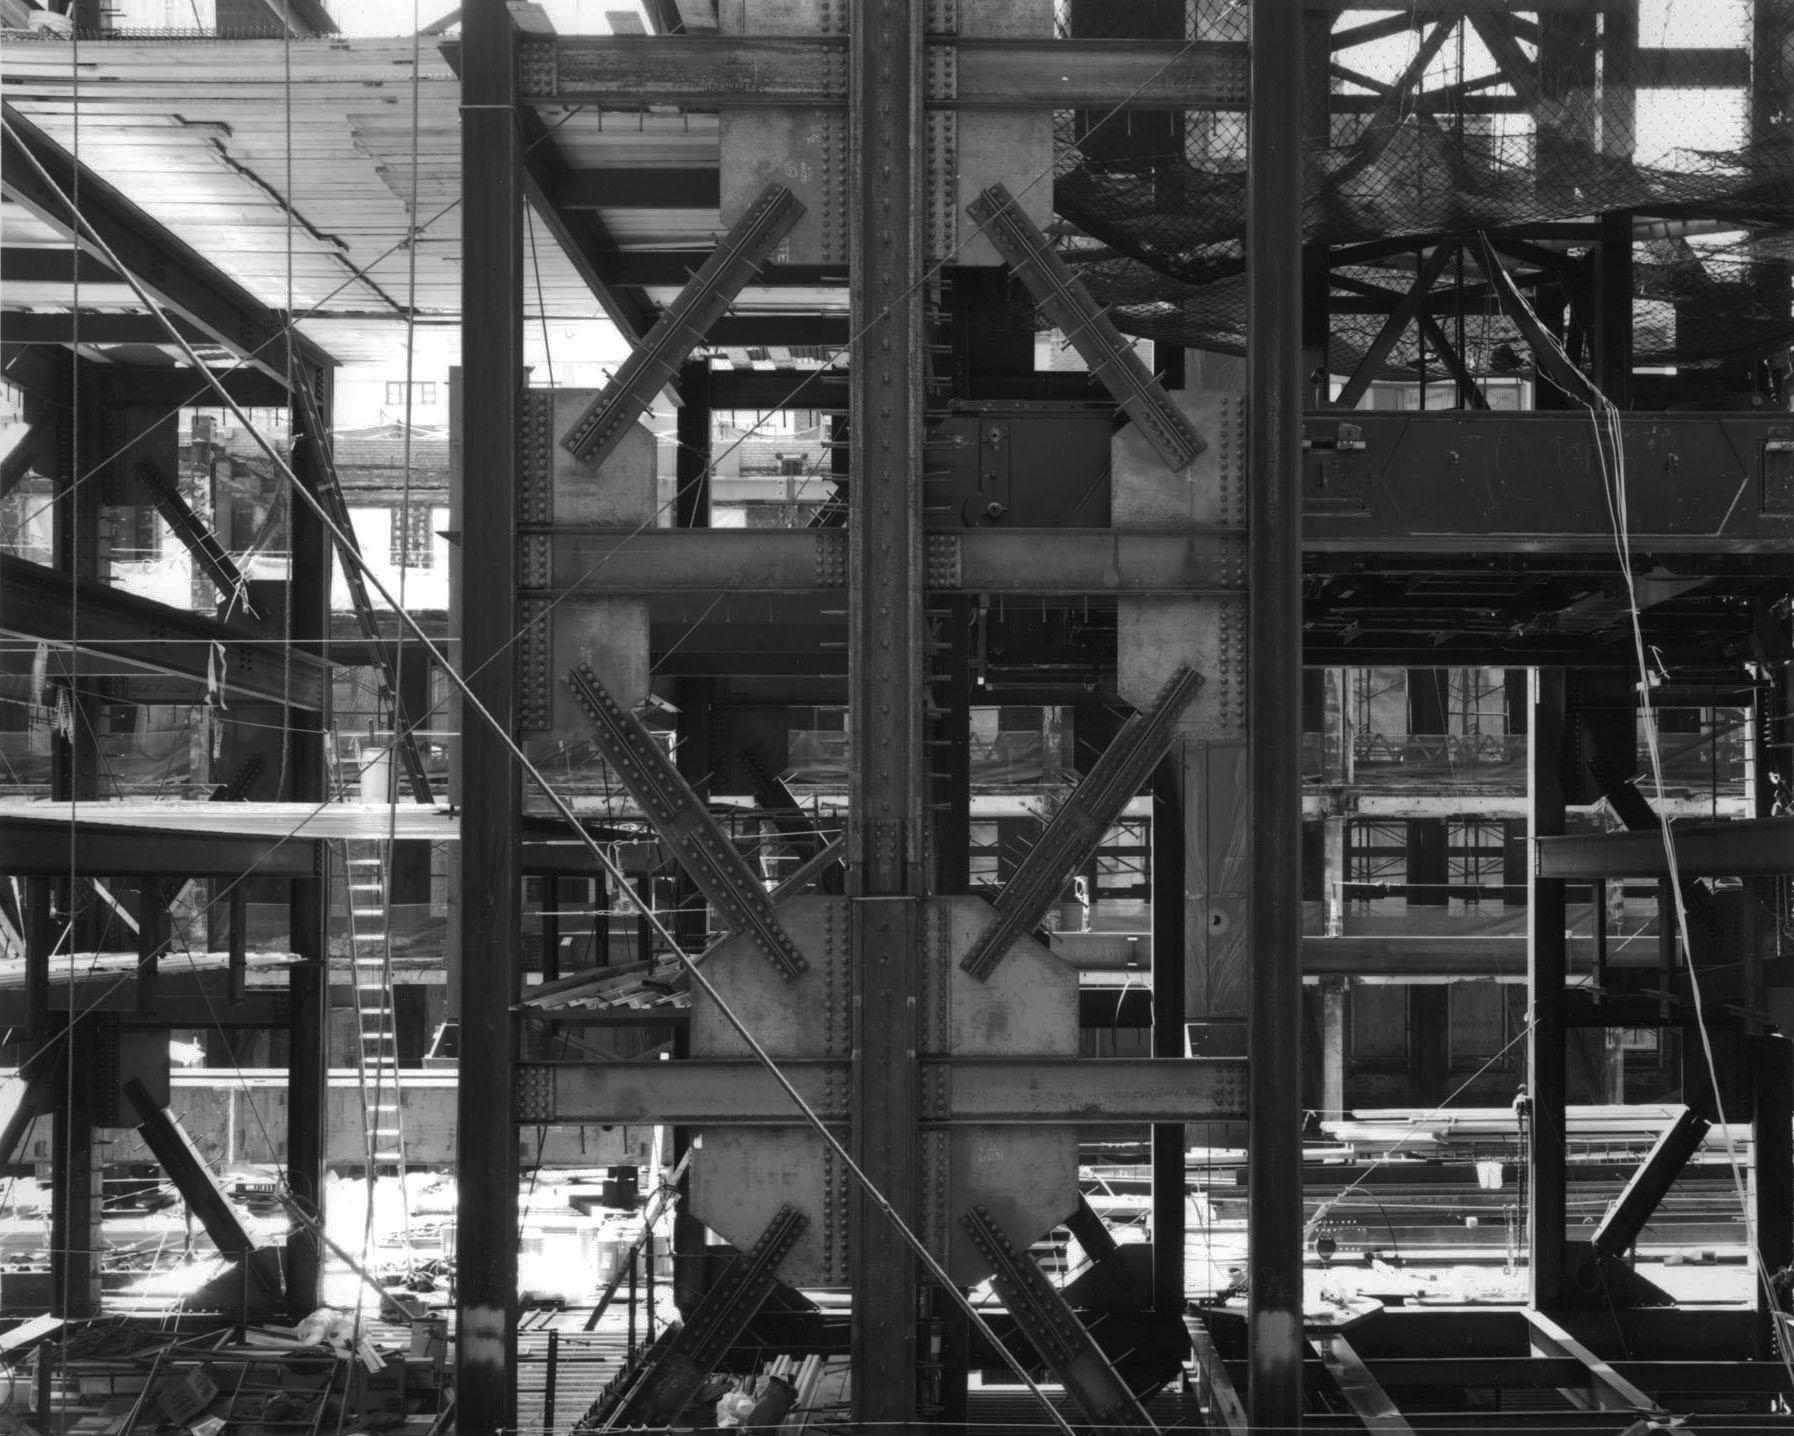 Untitled, New York, 2004